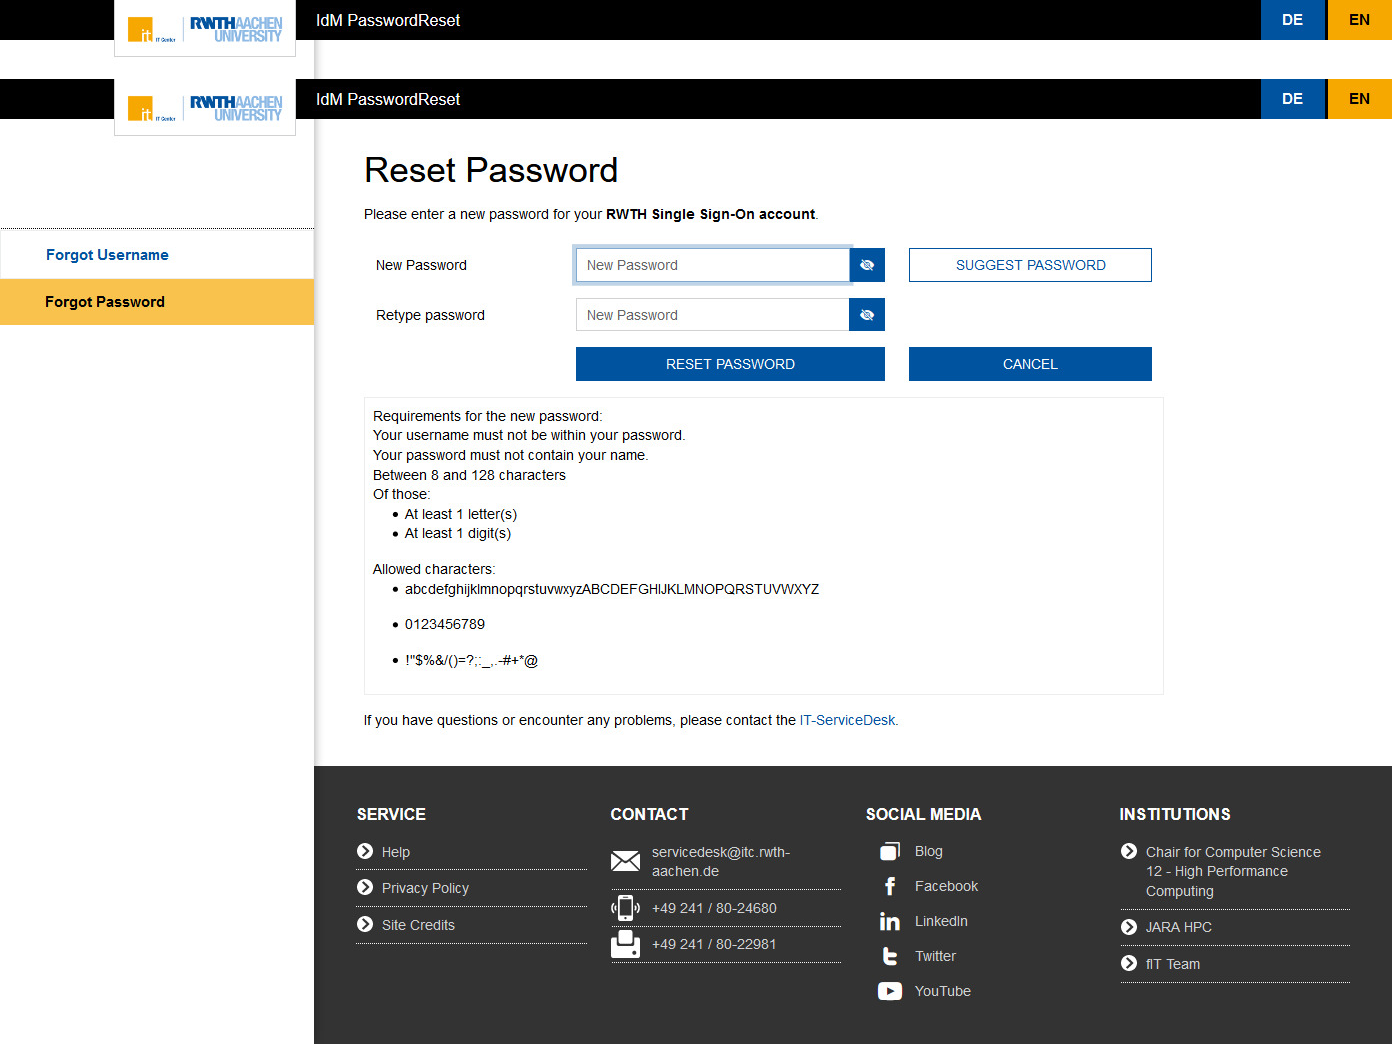 Reset password - new design